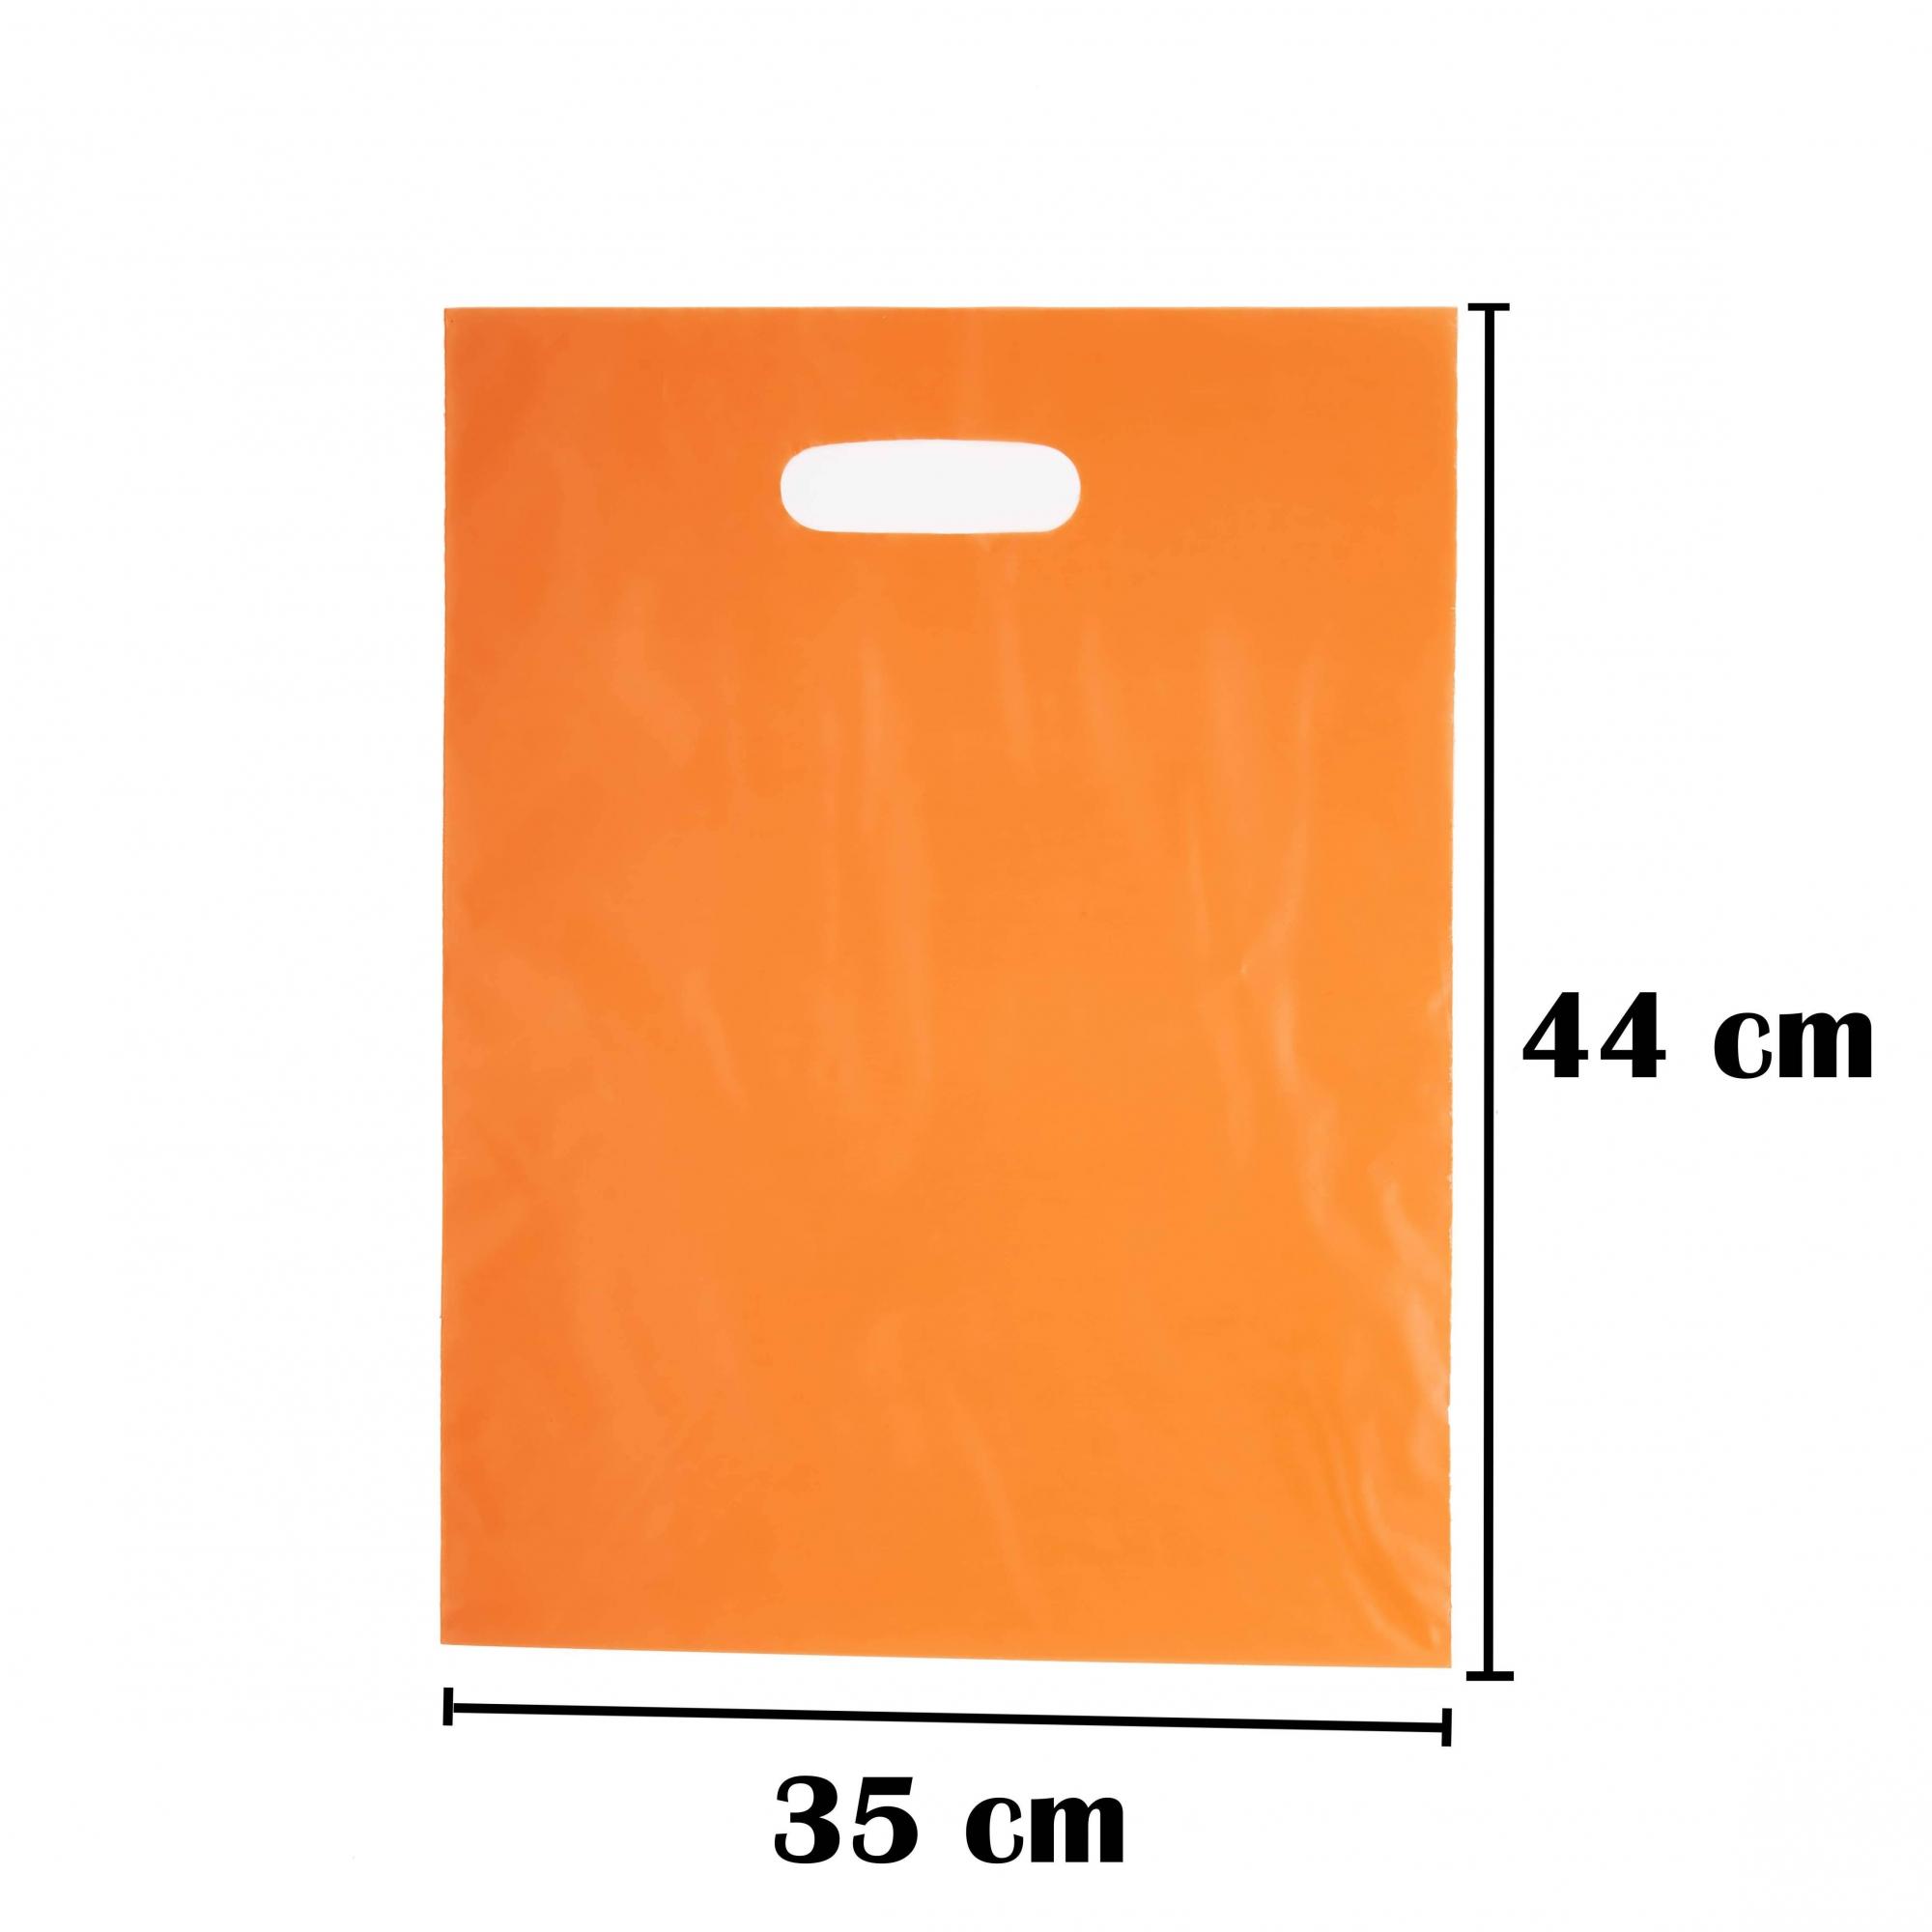 Sacola Plástica 35x44 Laranja Alça Boca de Palhaço 1.000 Unidades